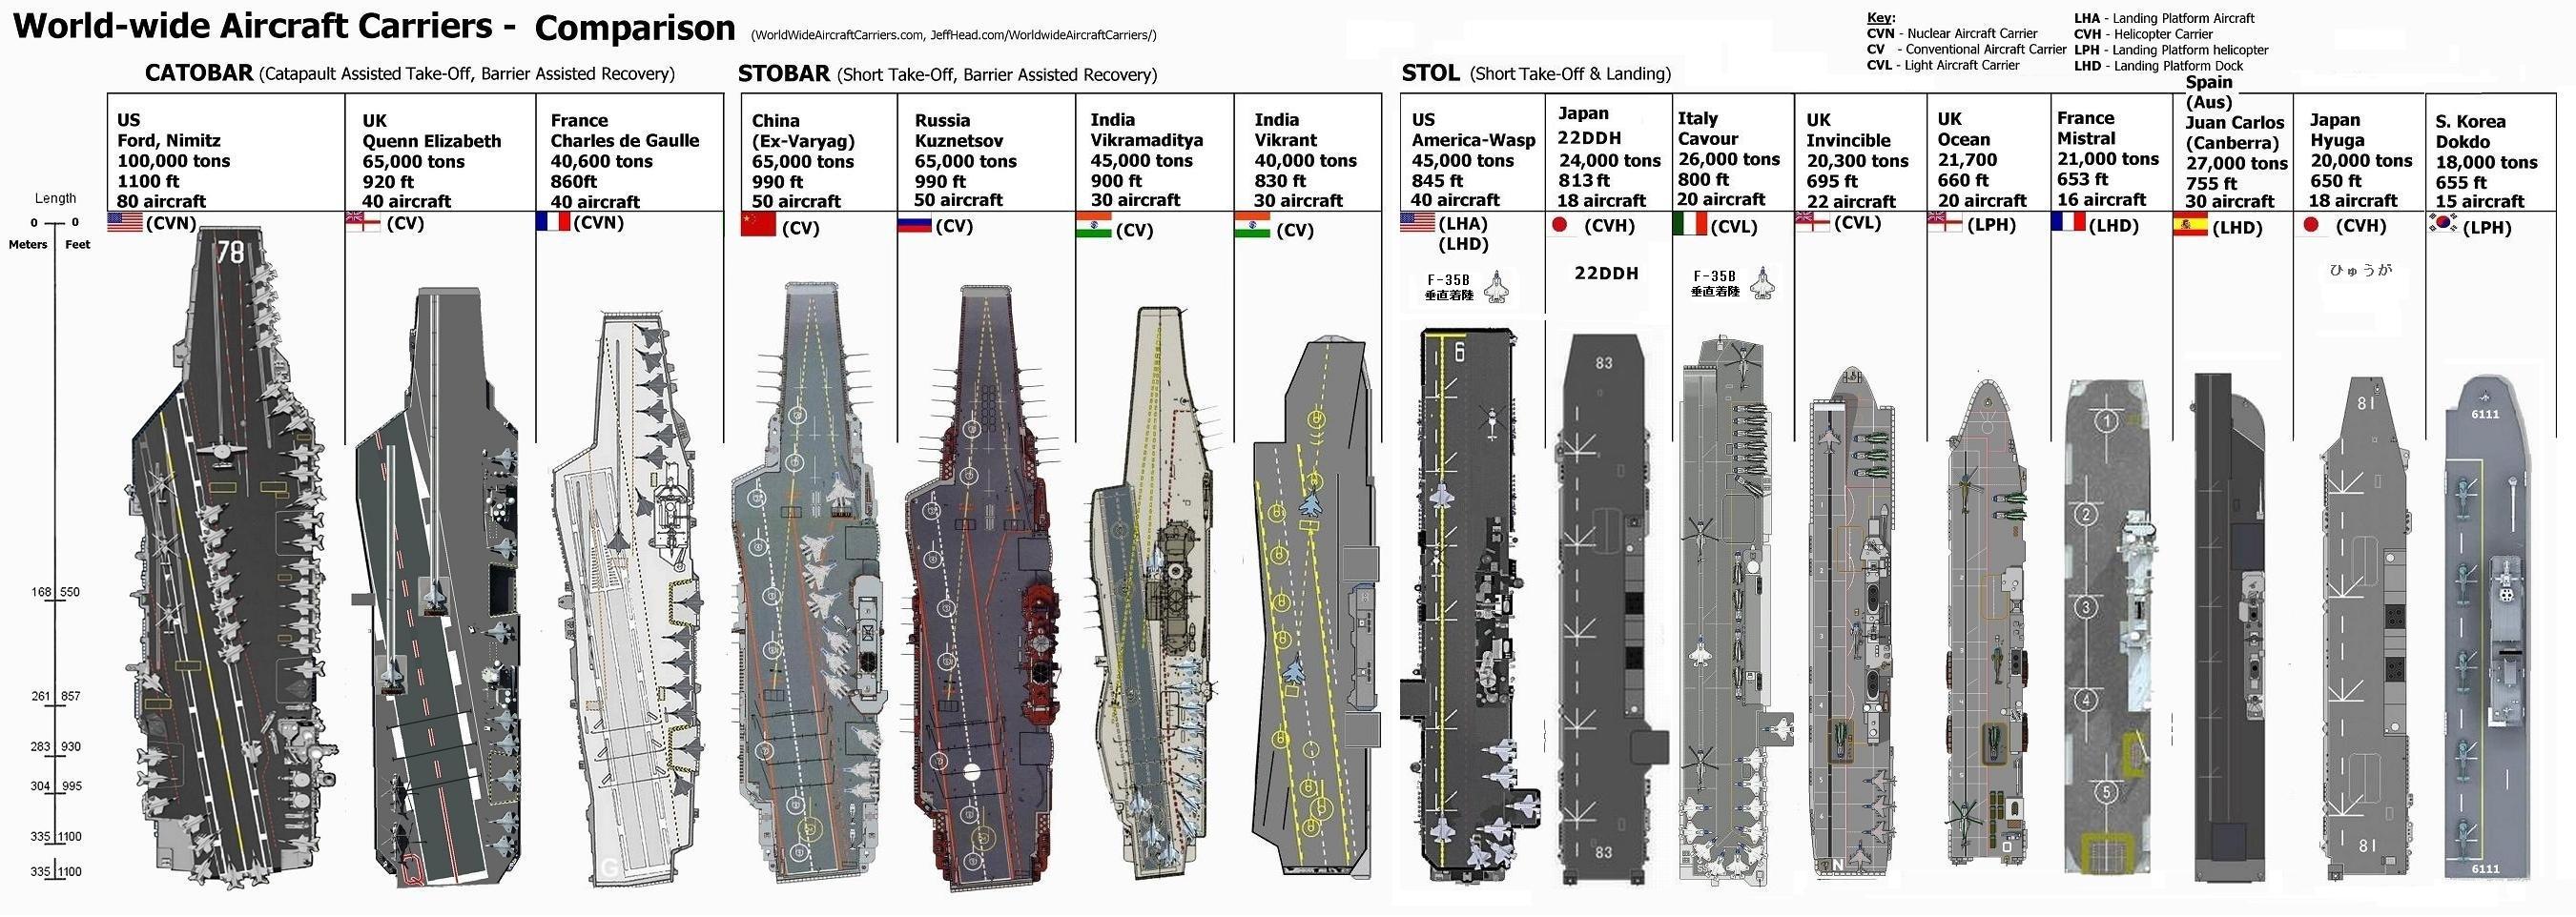 Uss Nimitz Size Comparison Cold War Aircra...